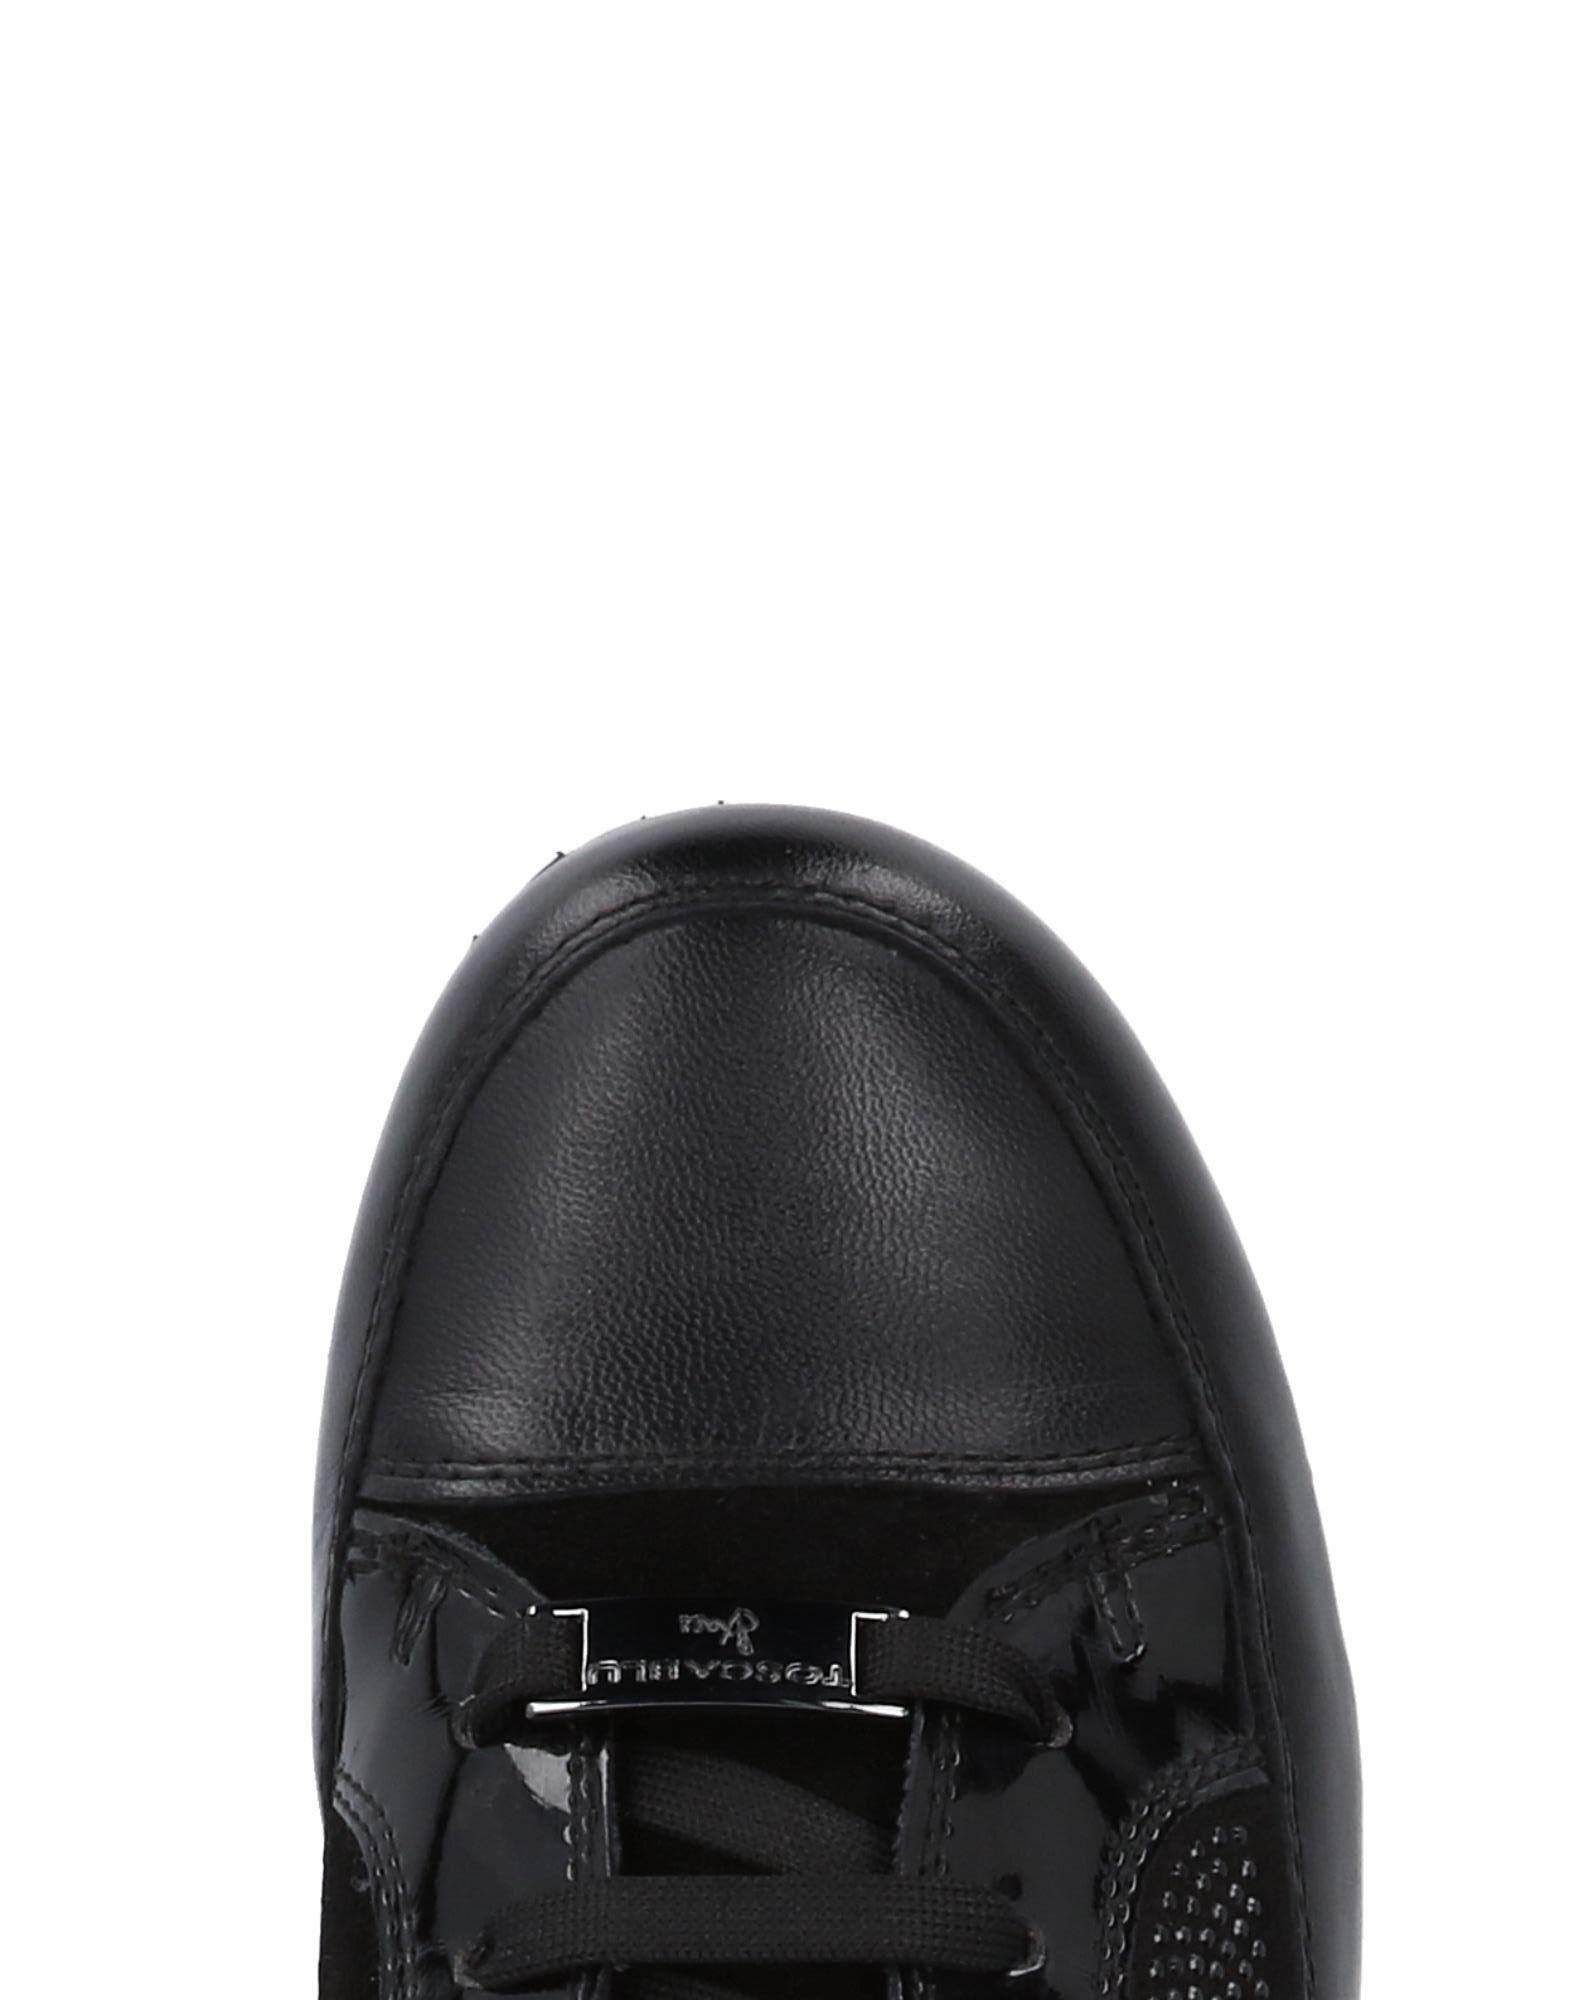 Tosca Blu Sneakers Damen beliebte  11490831EB Gute Qualität beliebte Damen Schuhe 2649f4